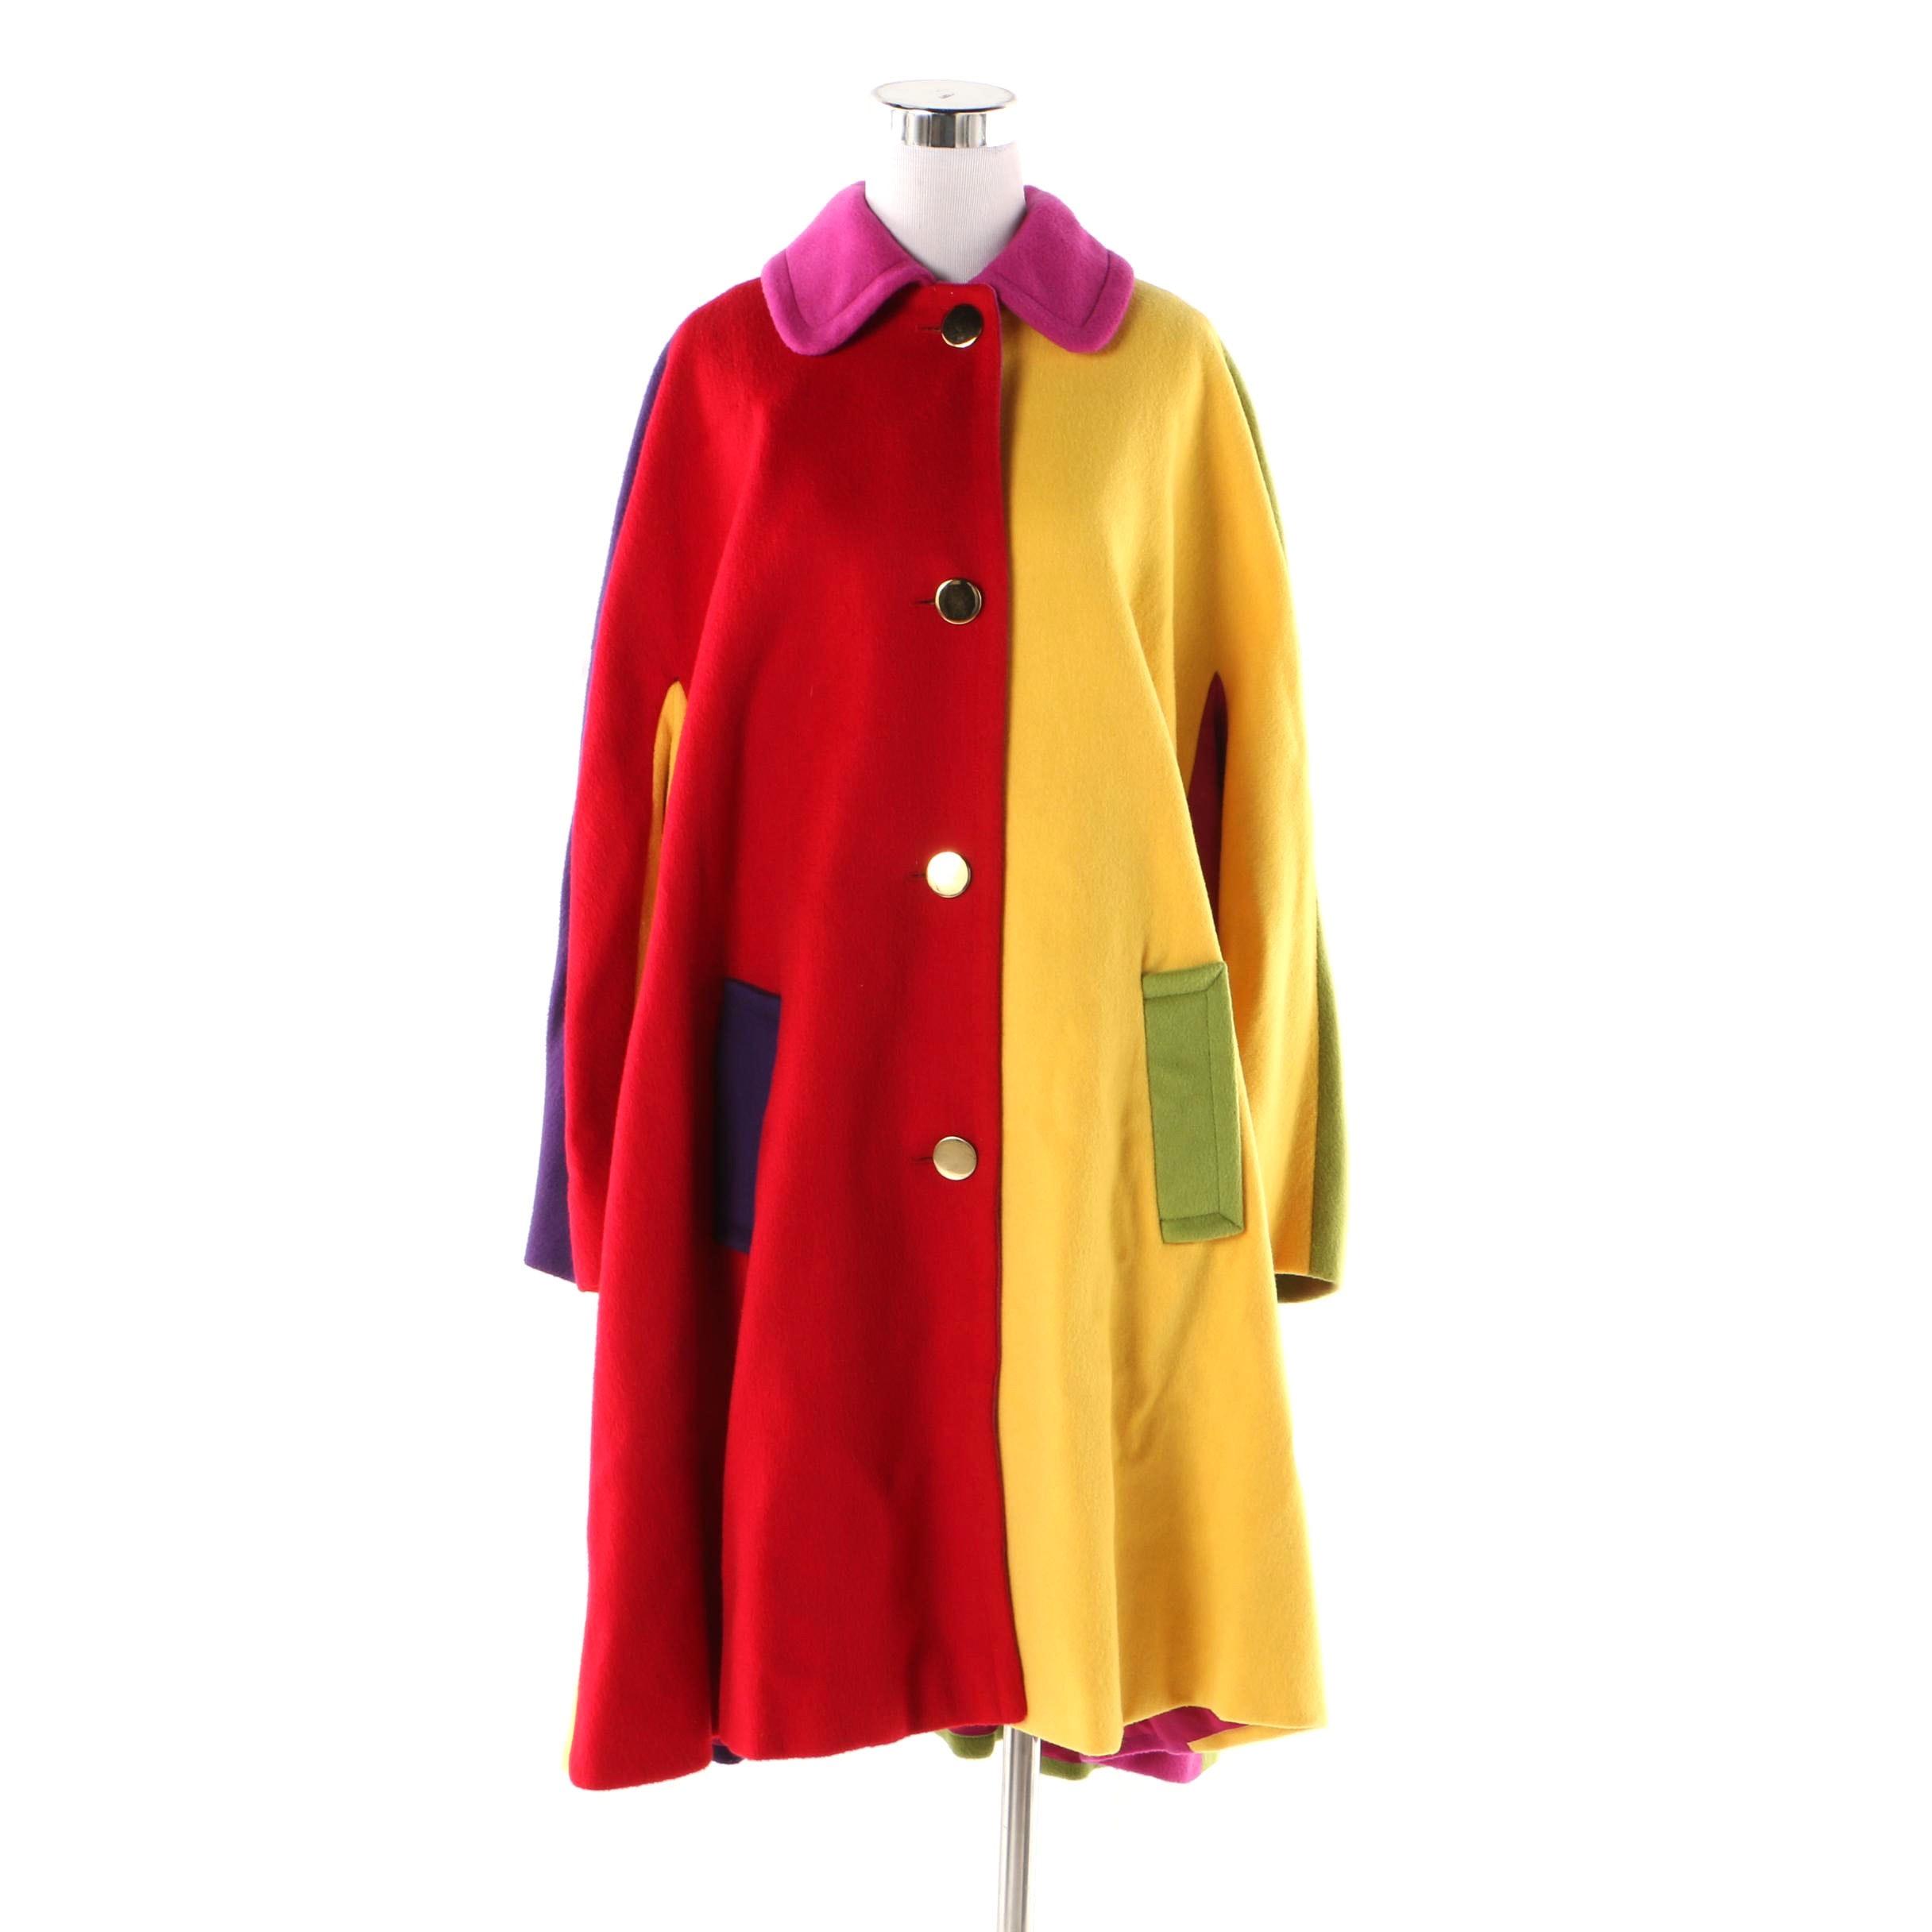 Women's Circa 1980s Vintage Bill Blass Color Block Wool Swing Coat